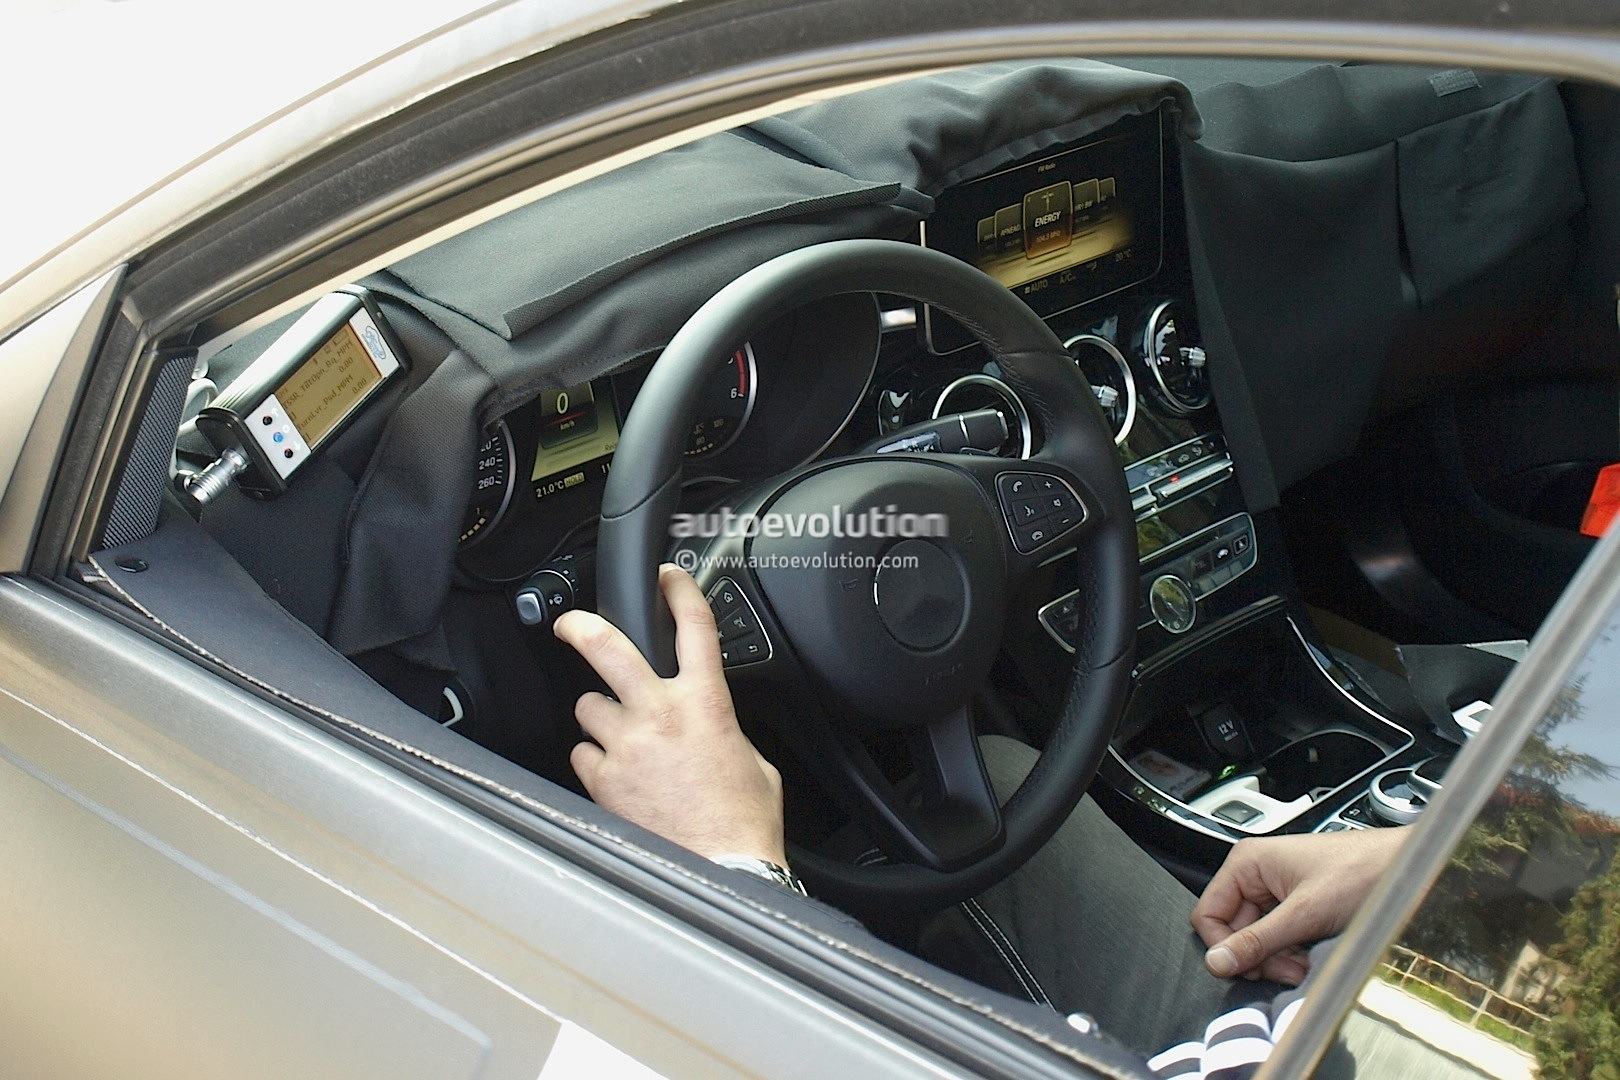 Spyshots 2015 mercedes benz c class interior revealed for Mercedes benz c class 2015 interior